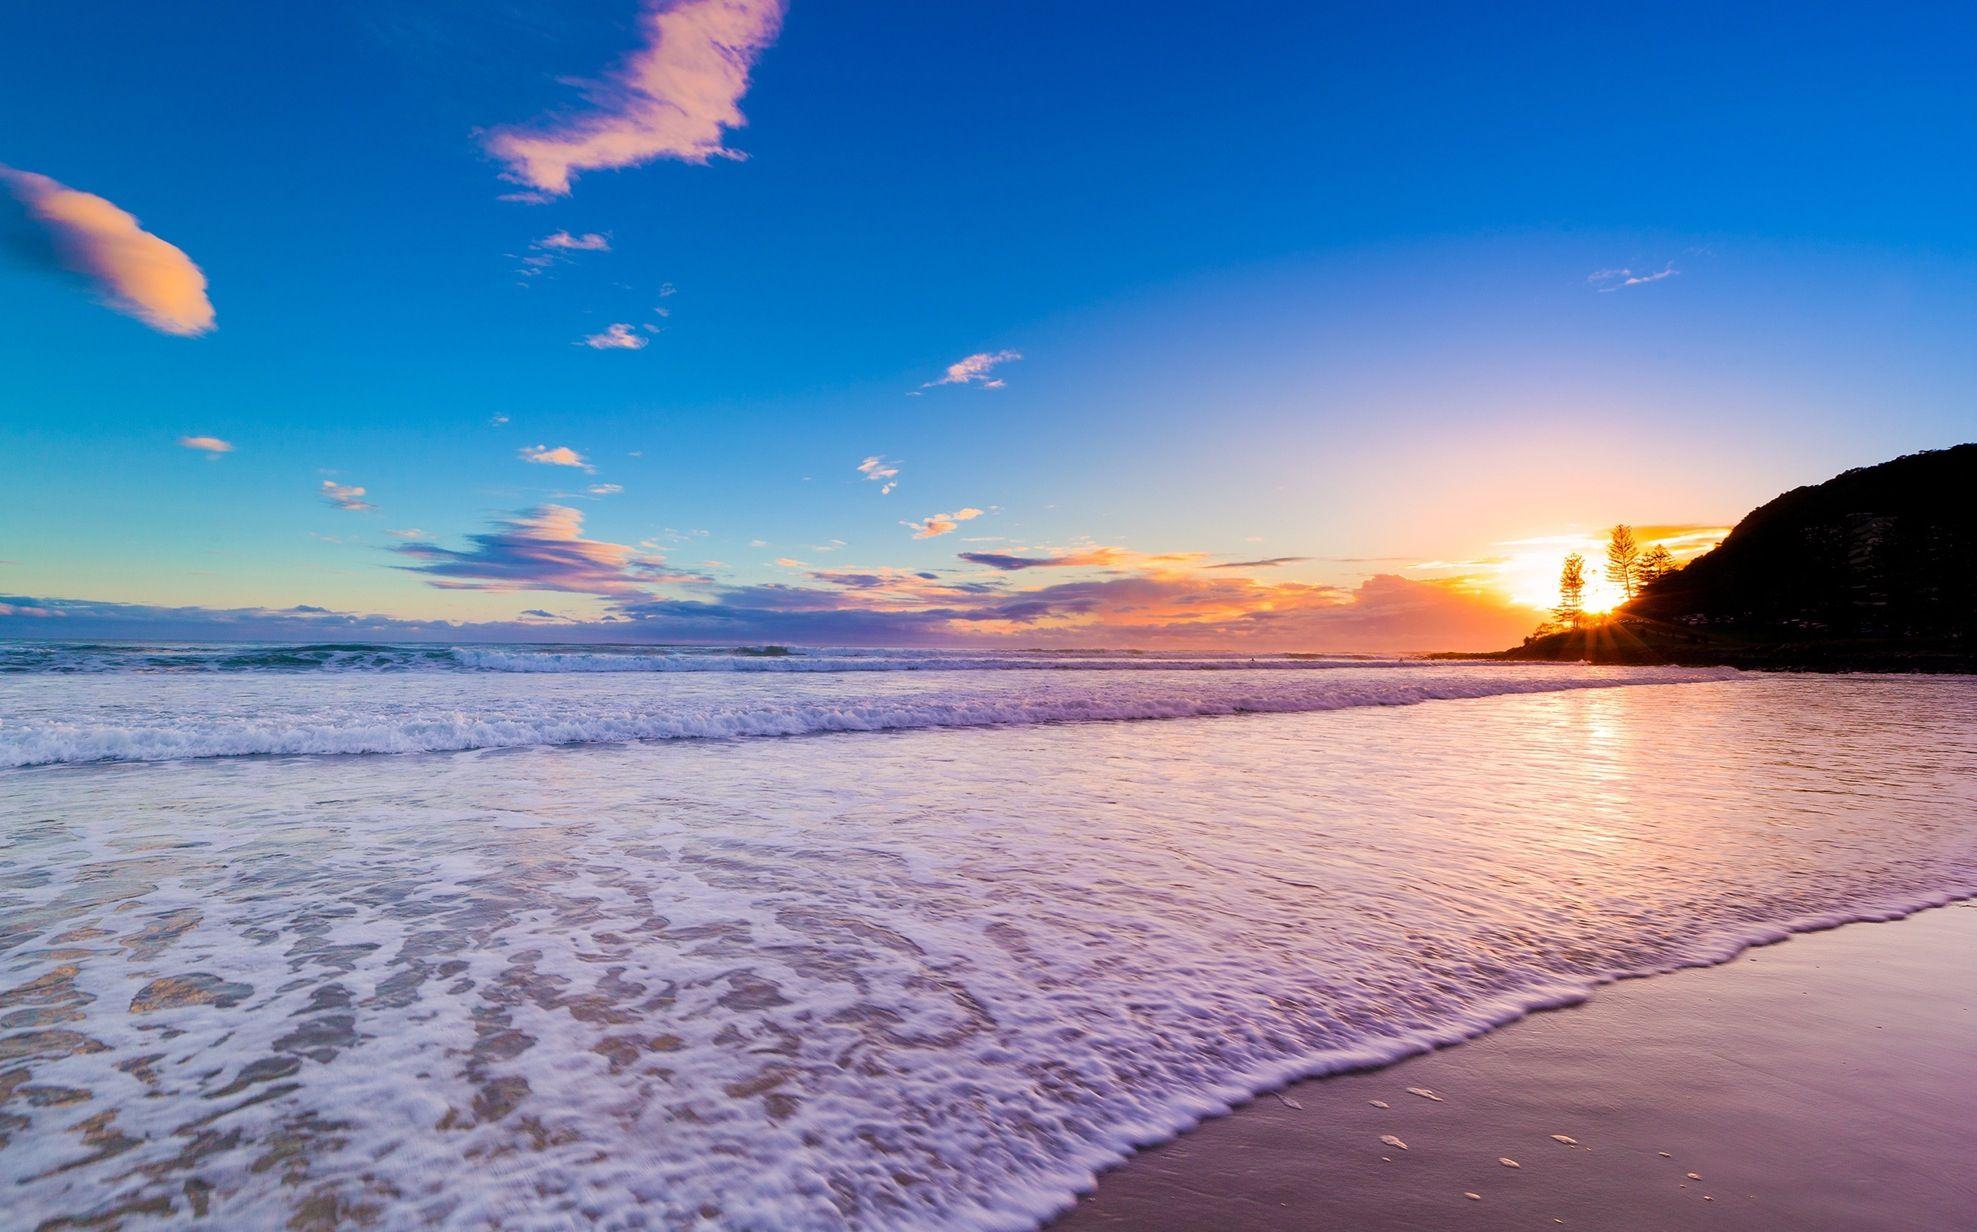 Gold Coast Queensland Australia Dream Travel Destinations Beach Landscapes Beautiful Sunrise Amazing World P Beach Wallpaper Nature Wallpaper Nature